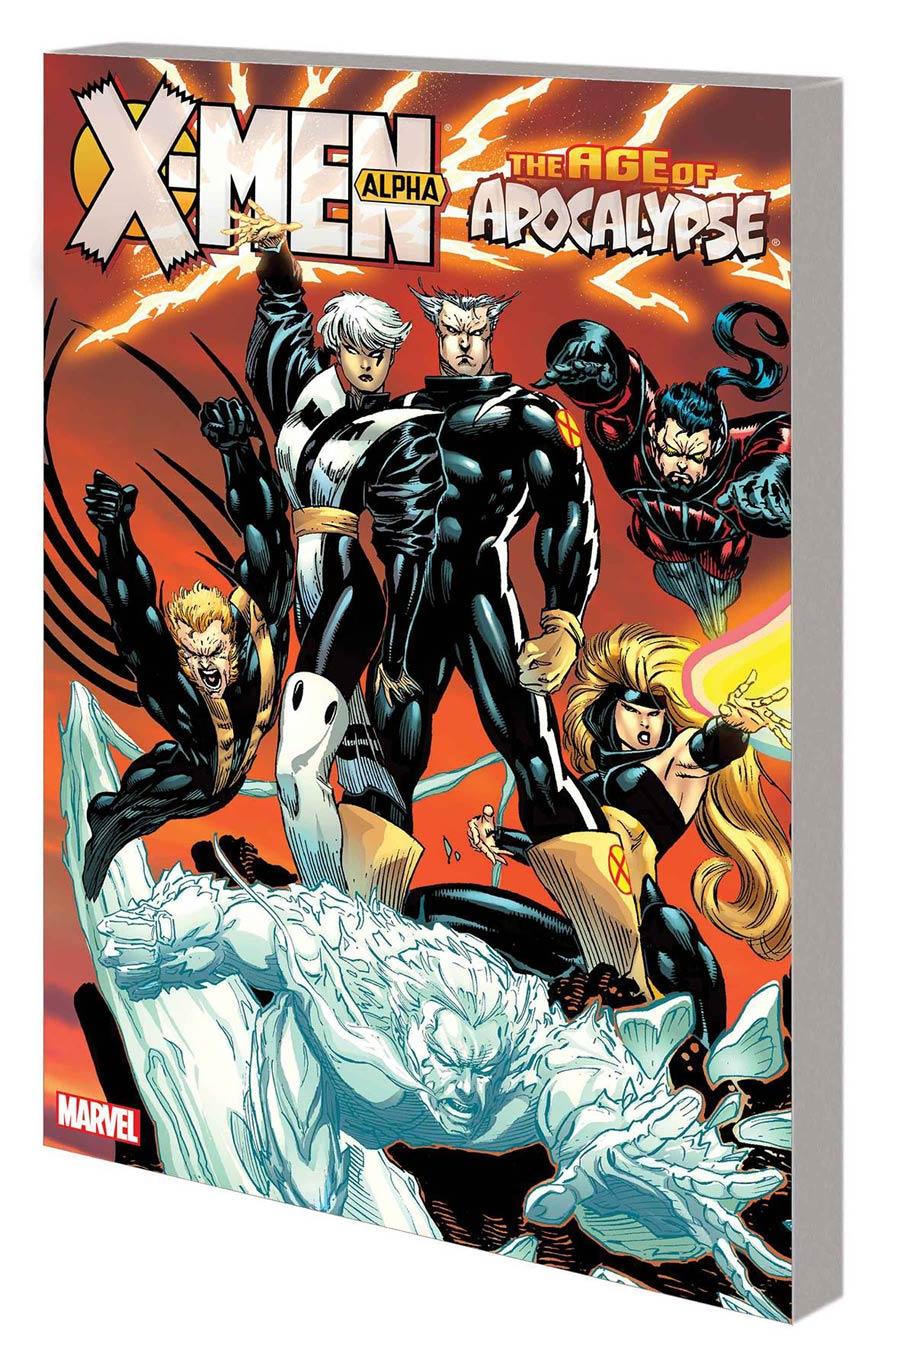 X-Men Age Of Apocalypse Vol 1 Alpha TP New Printing